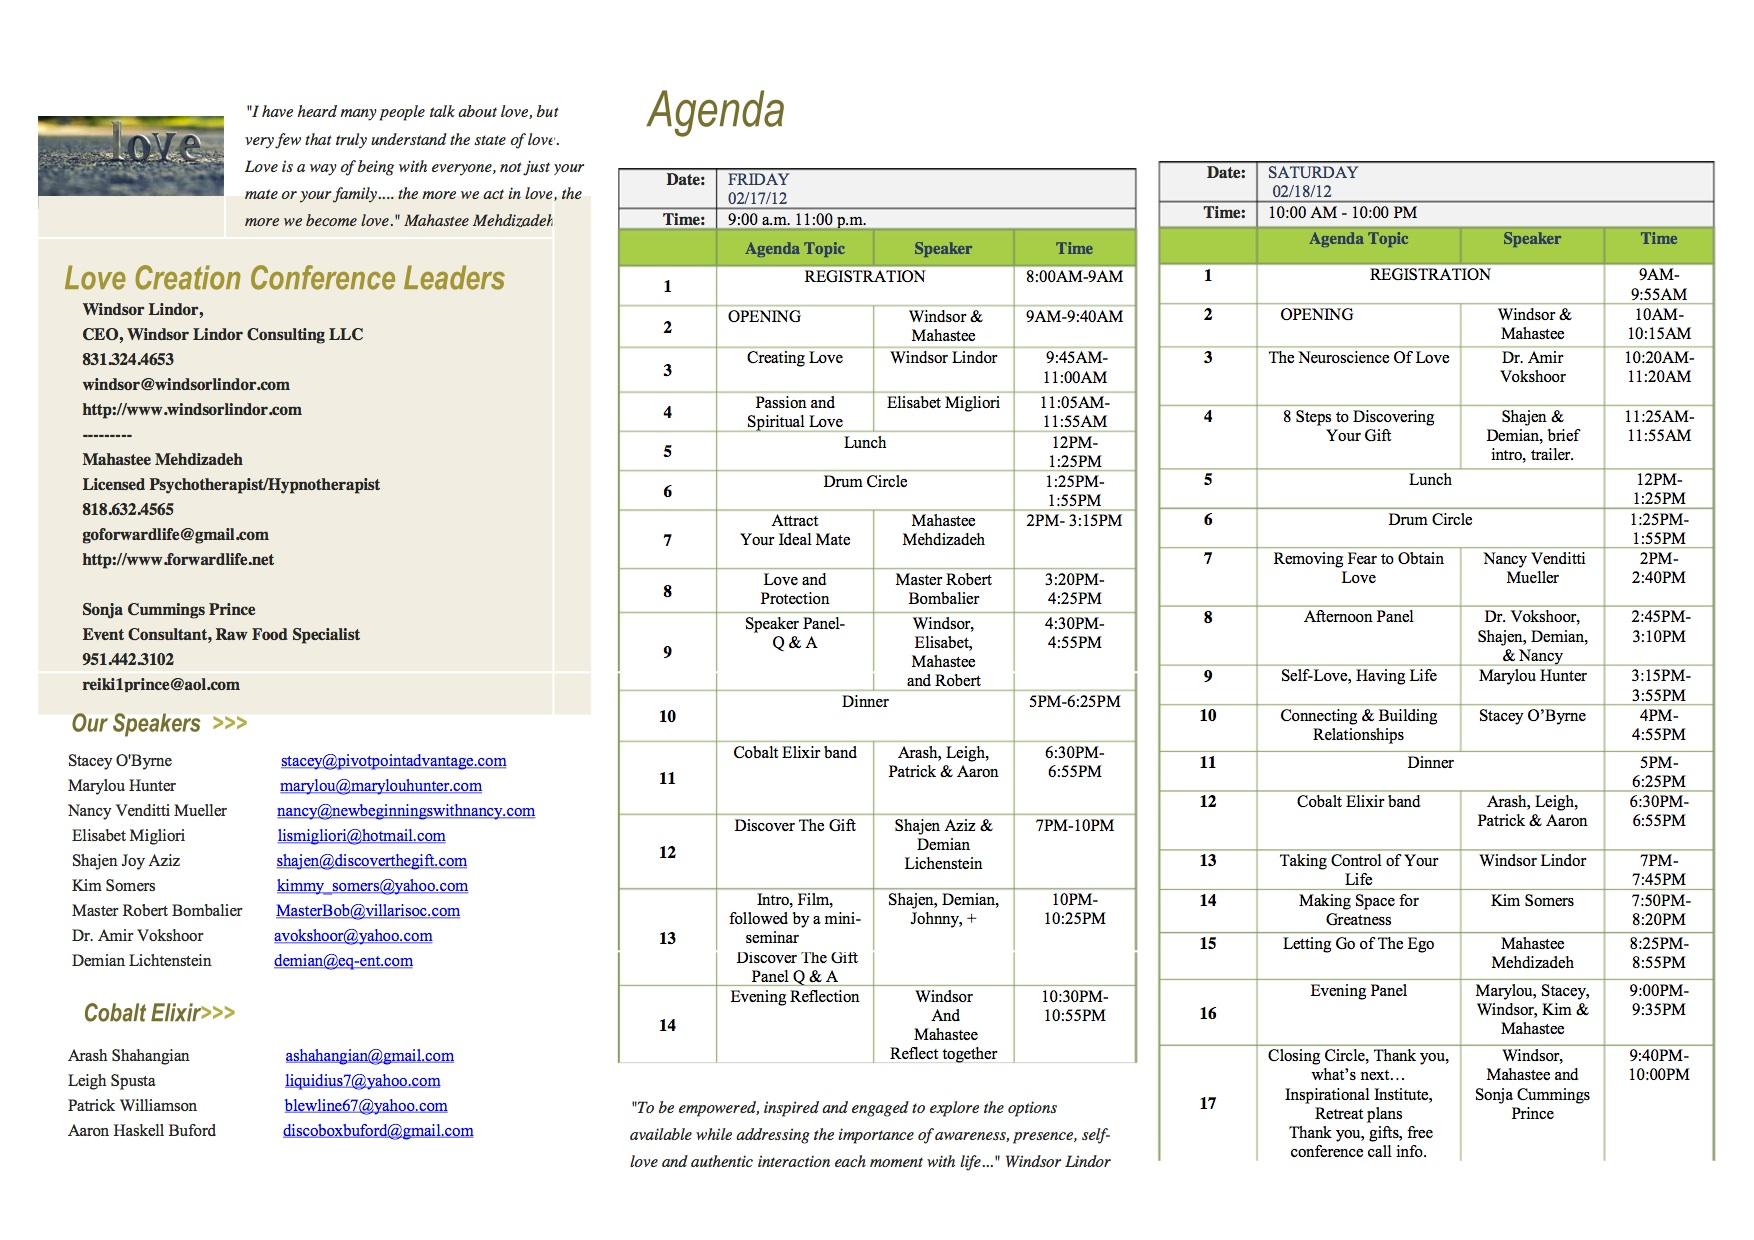 Love Creation Conference Program Schedule